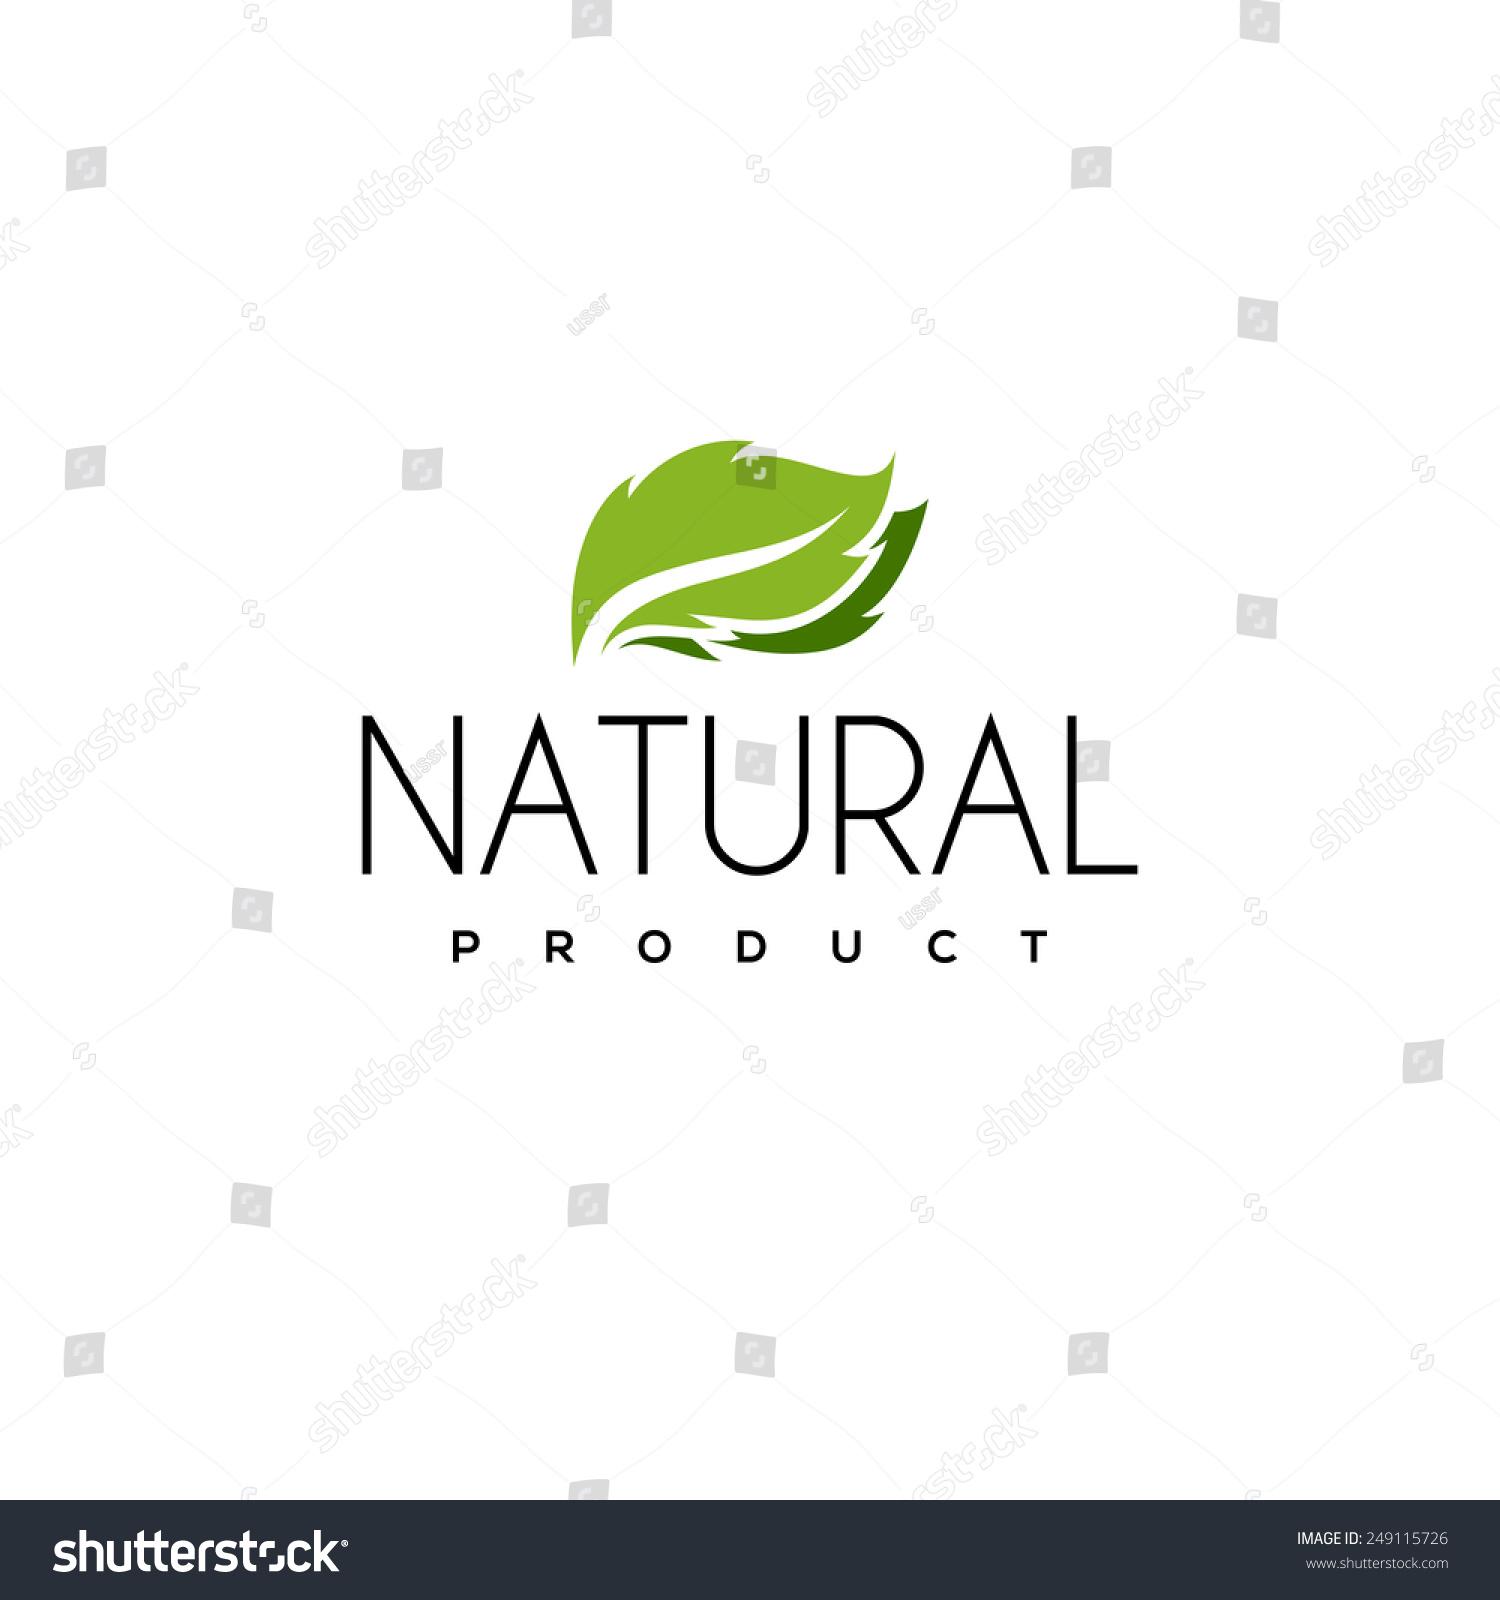 Supplement Logo Designs  6495 Logos to Browse